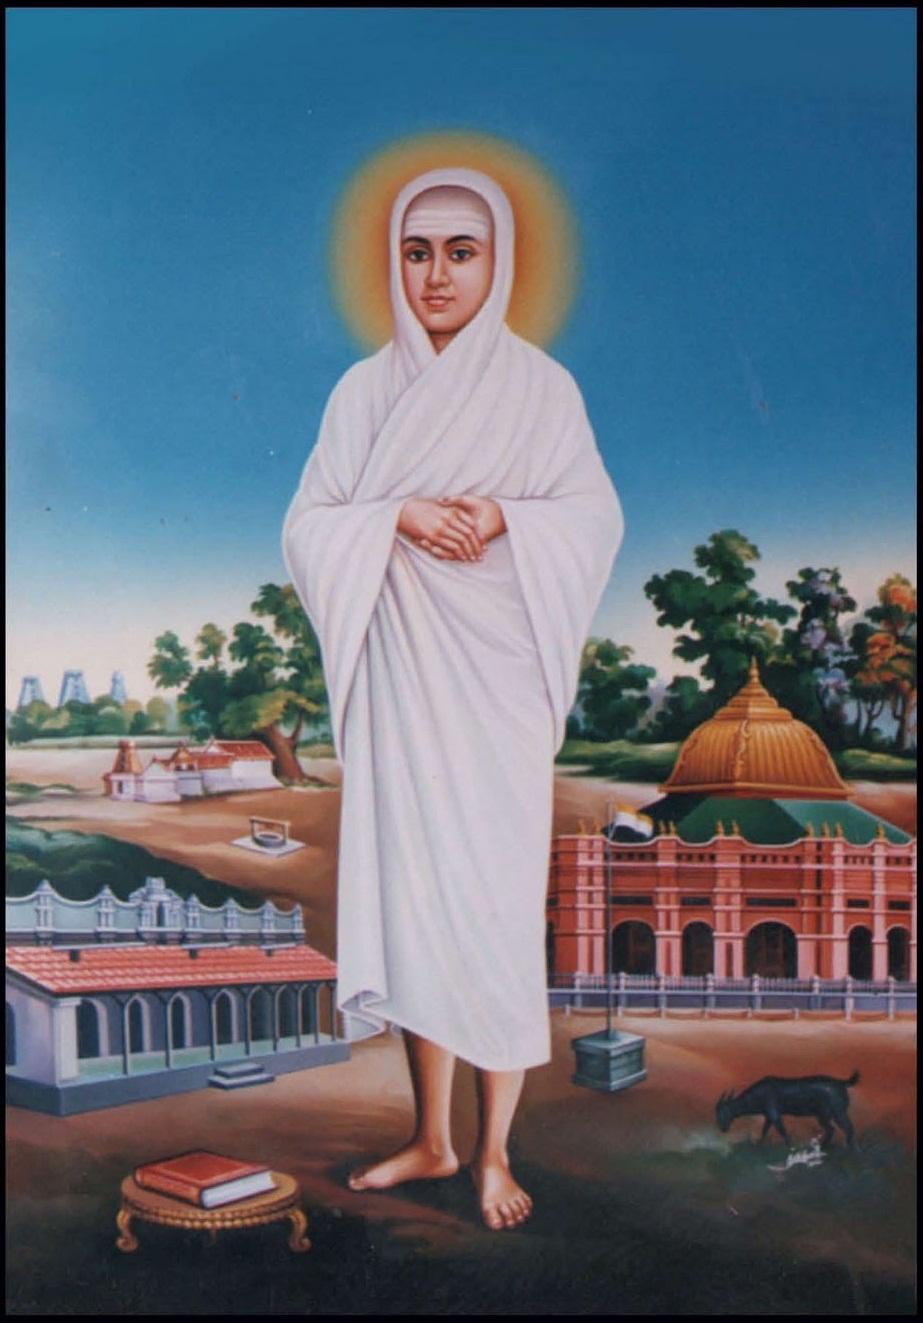 Sri Ramalinga Adigal